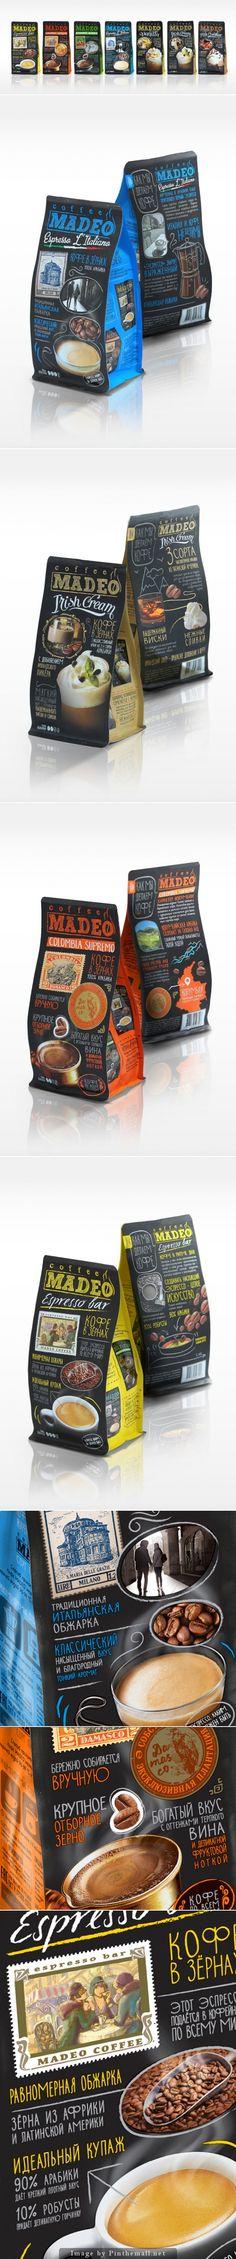 Madeo #Coffee, Creative Agency: Getbrand - http://www.packagingoftheworld.com/2014/10/madeo-coffee.html